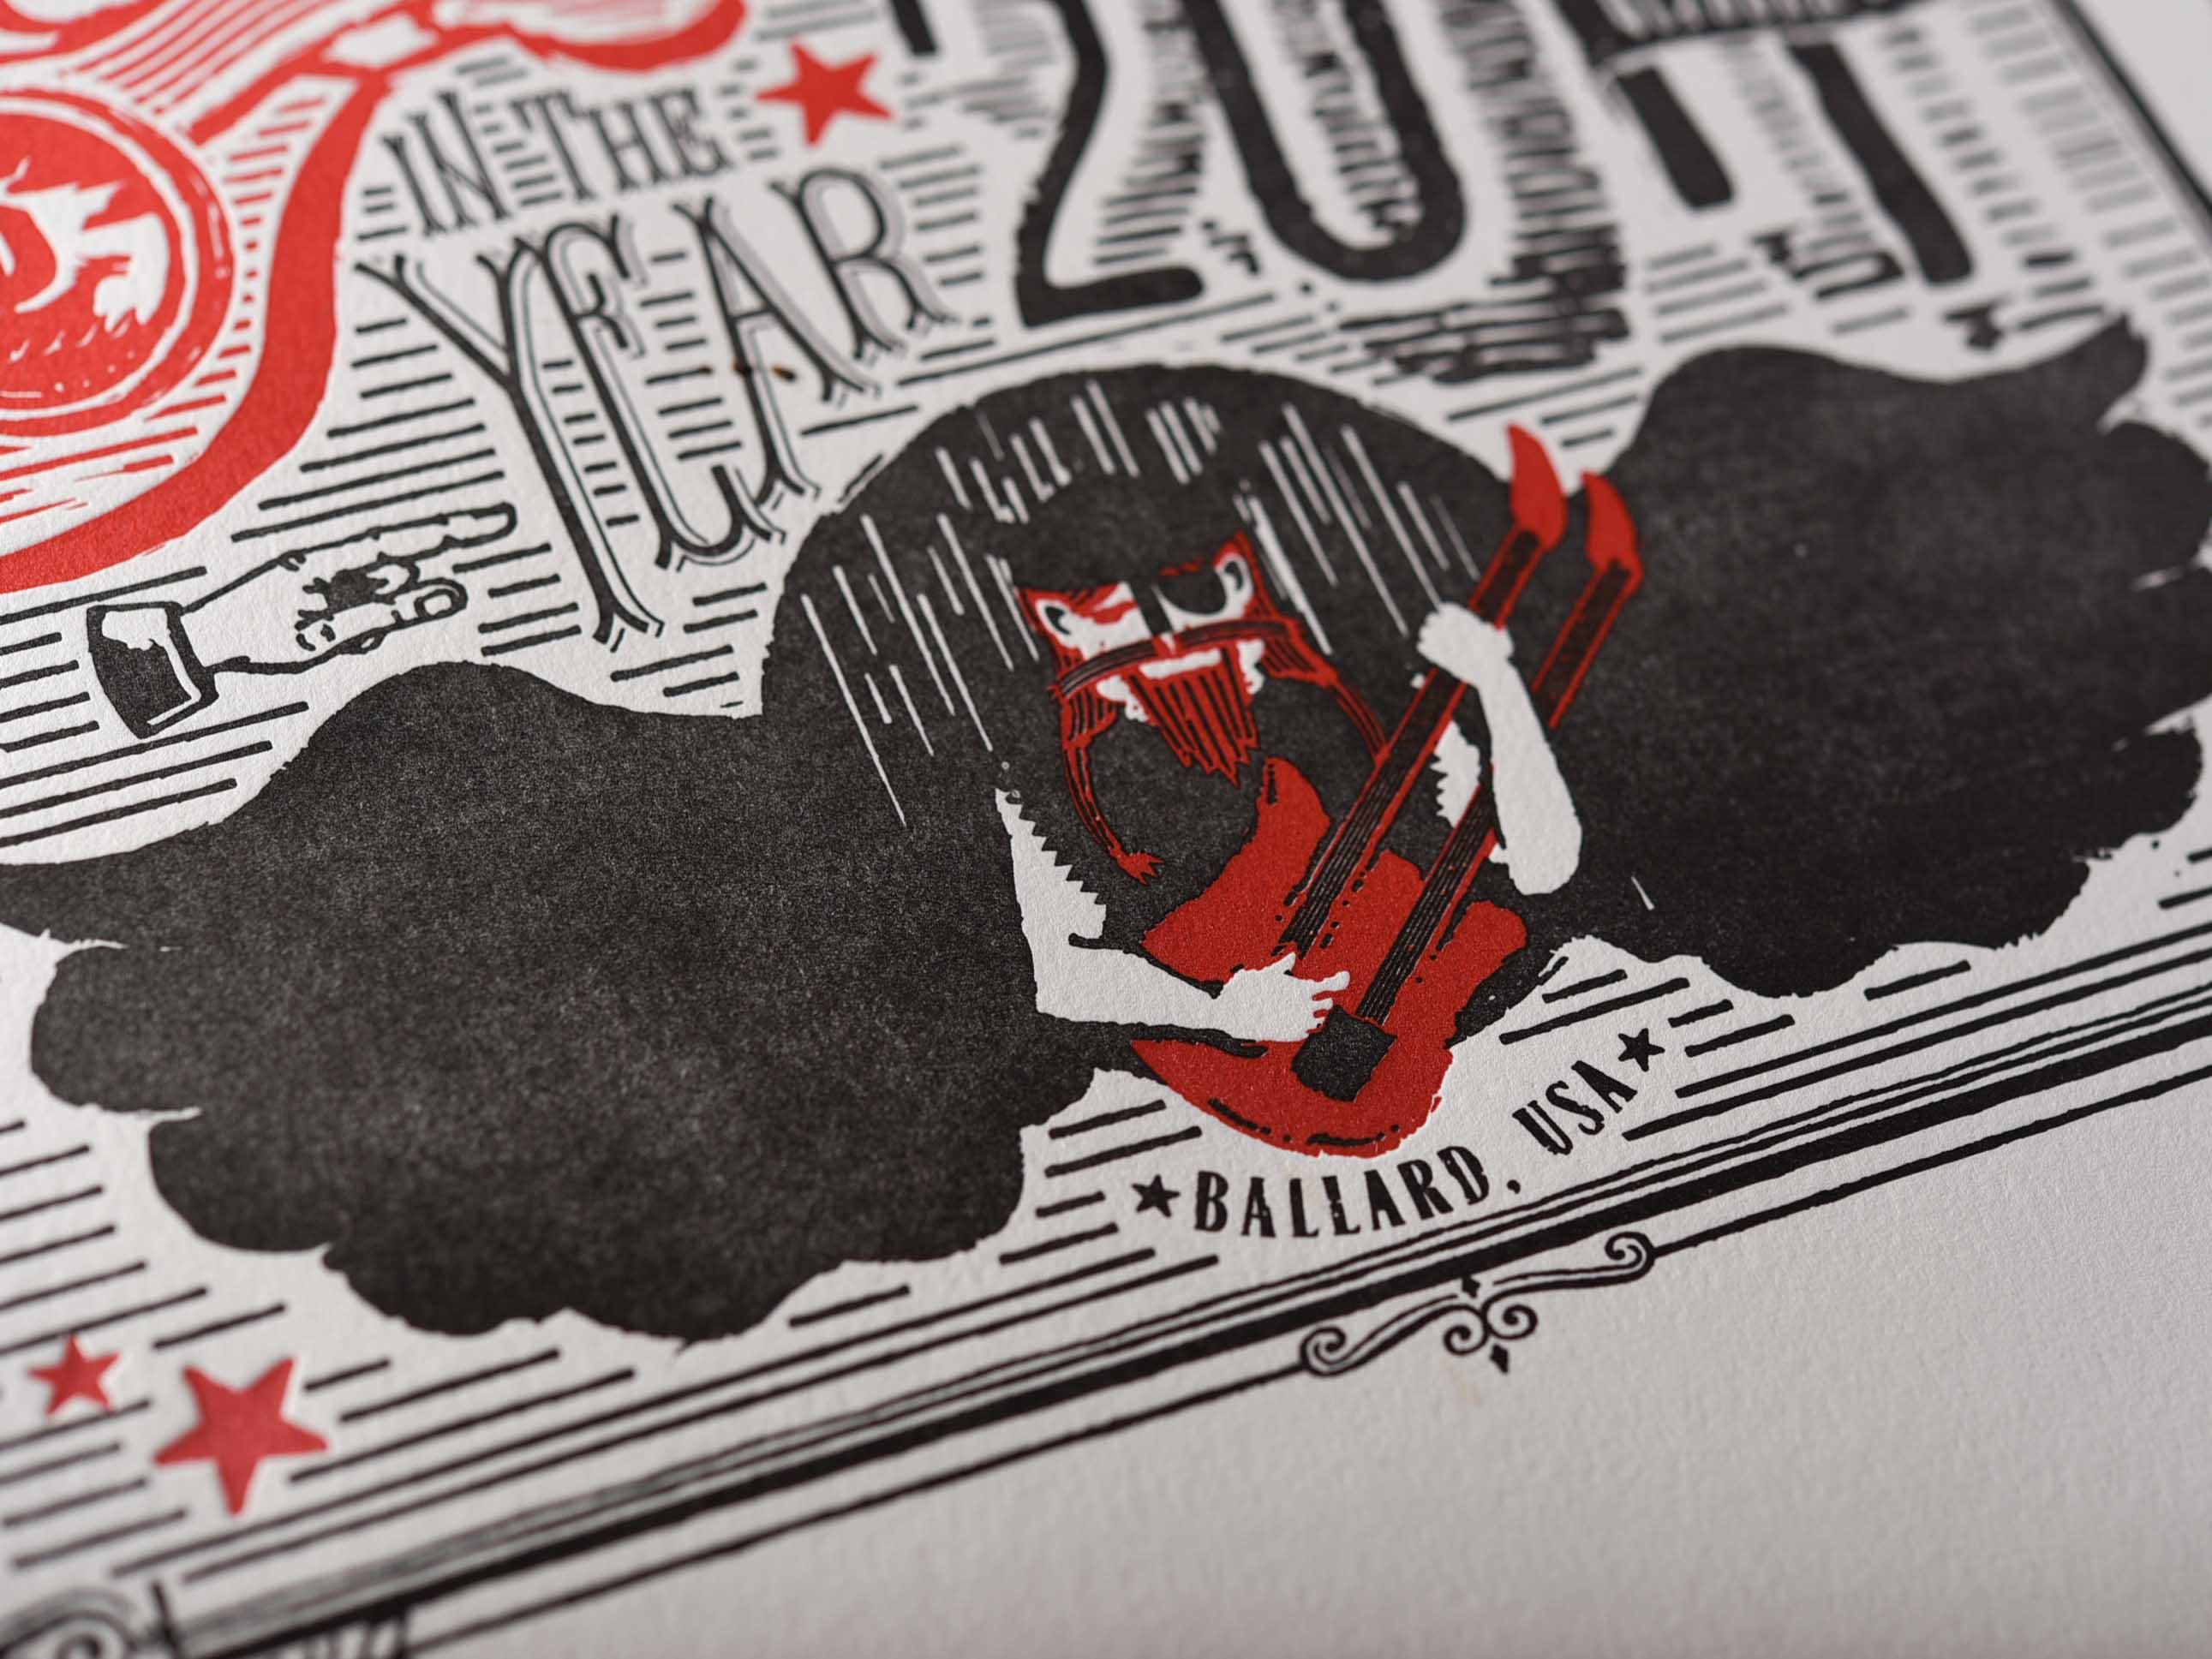 local music festival rock angel letterpress design